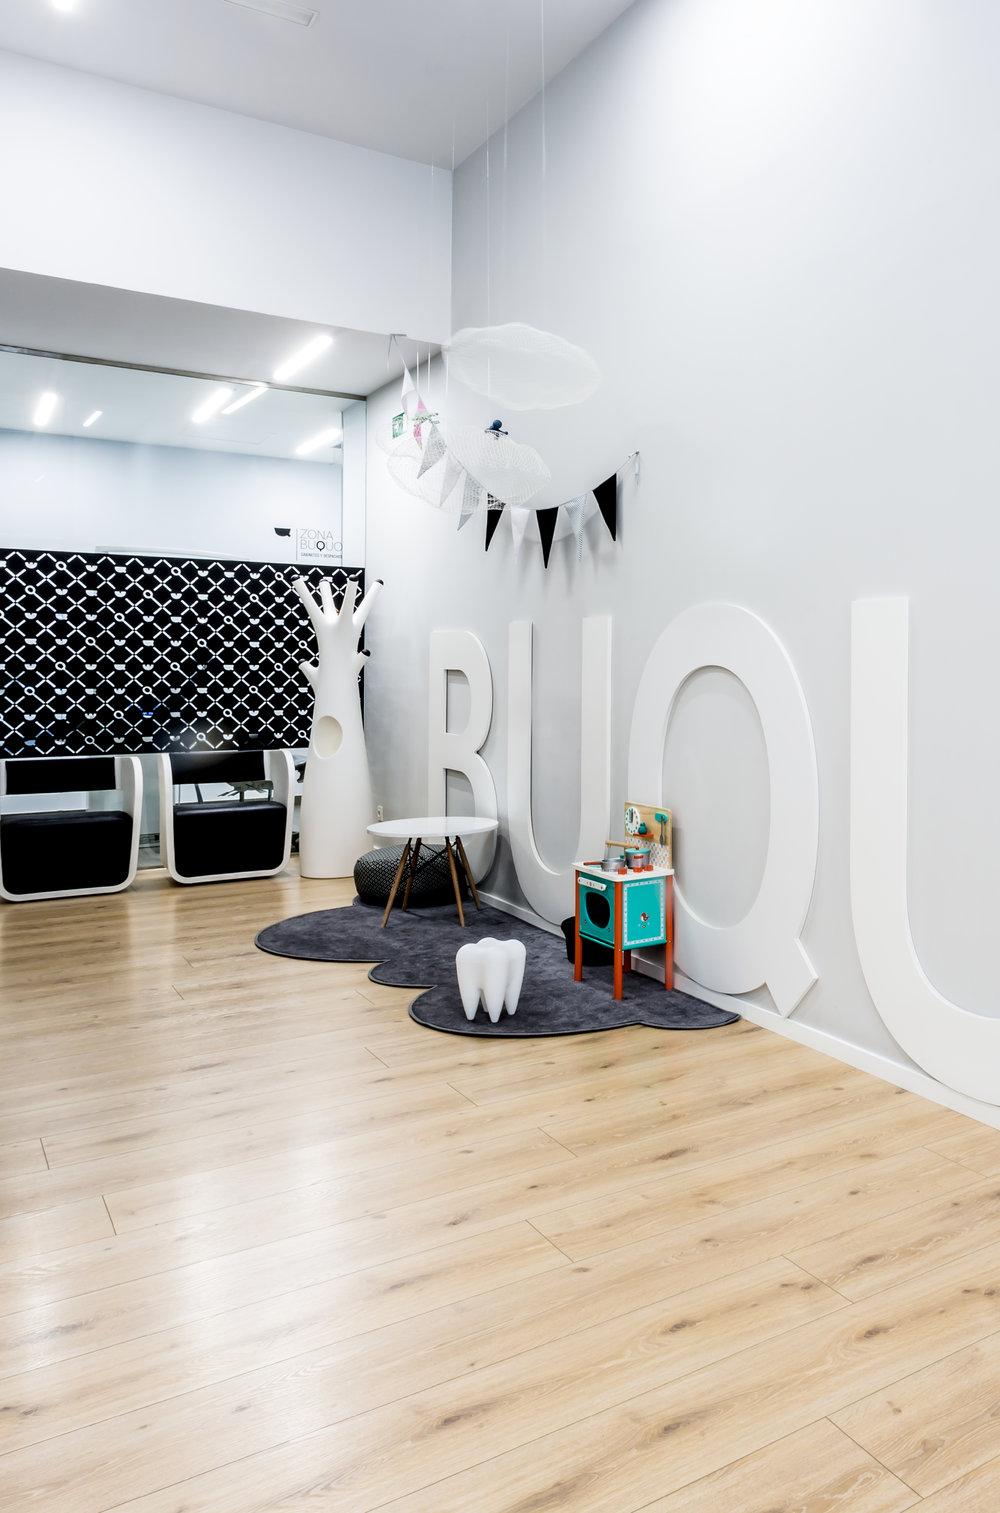 BUQUO-HOME2.jpg